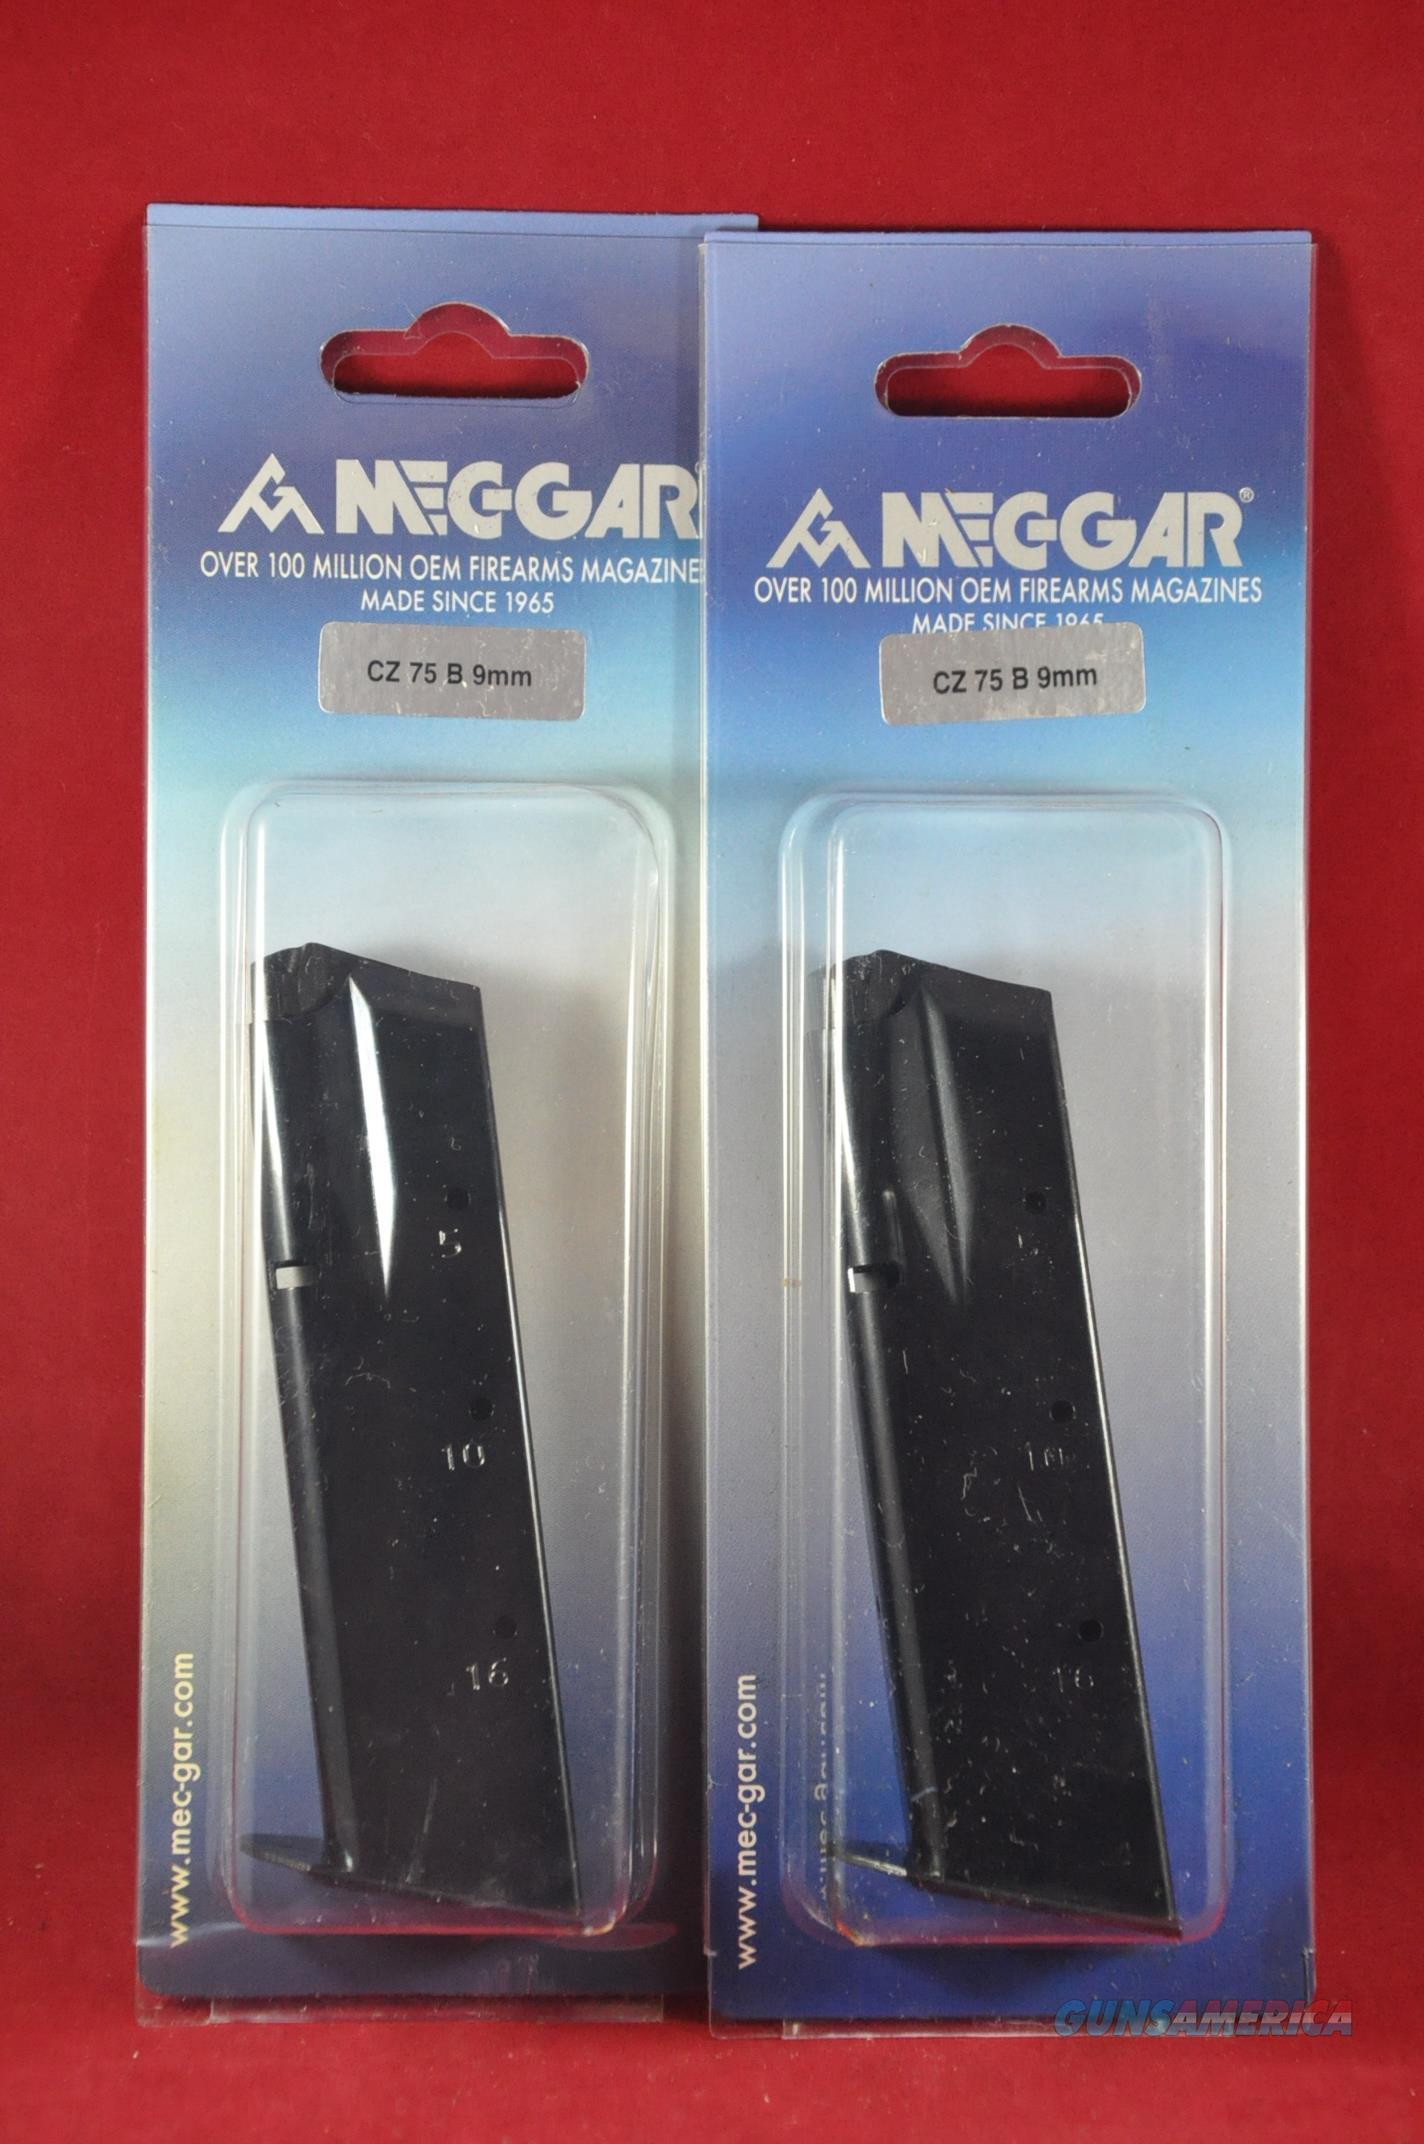 2 Pack MEC-GAR CZ75 9MM 16RD Magazine NoCCFee MGCZ7516B  Non-Guns > Magazines & Clips > Pistol Magazines > Other